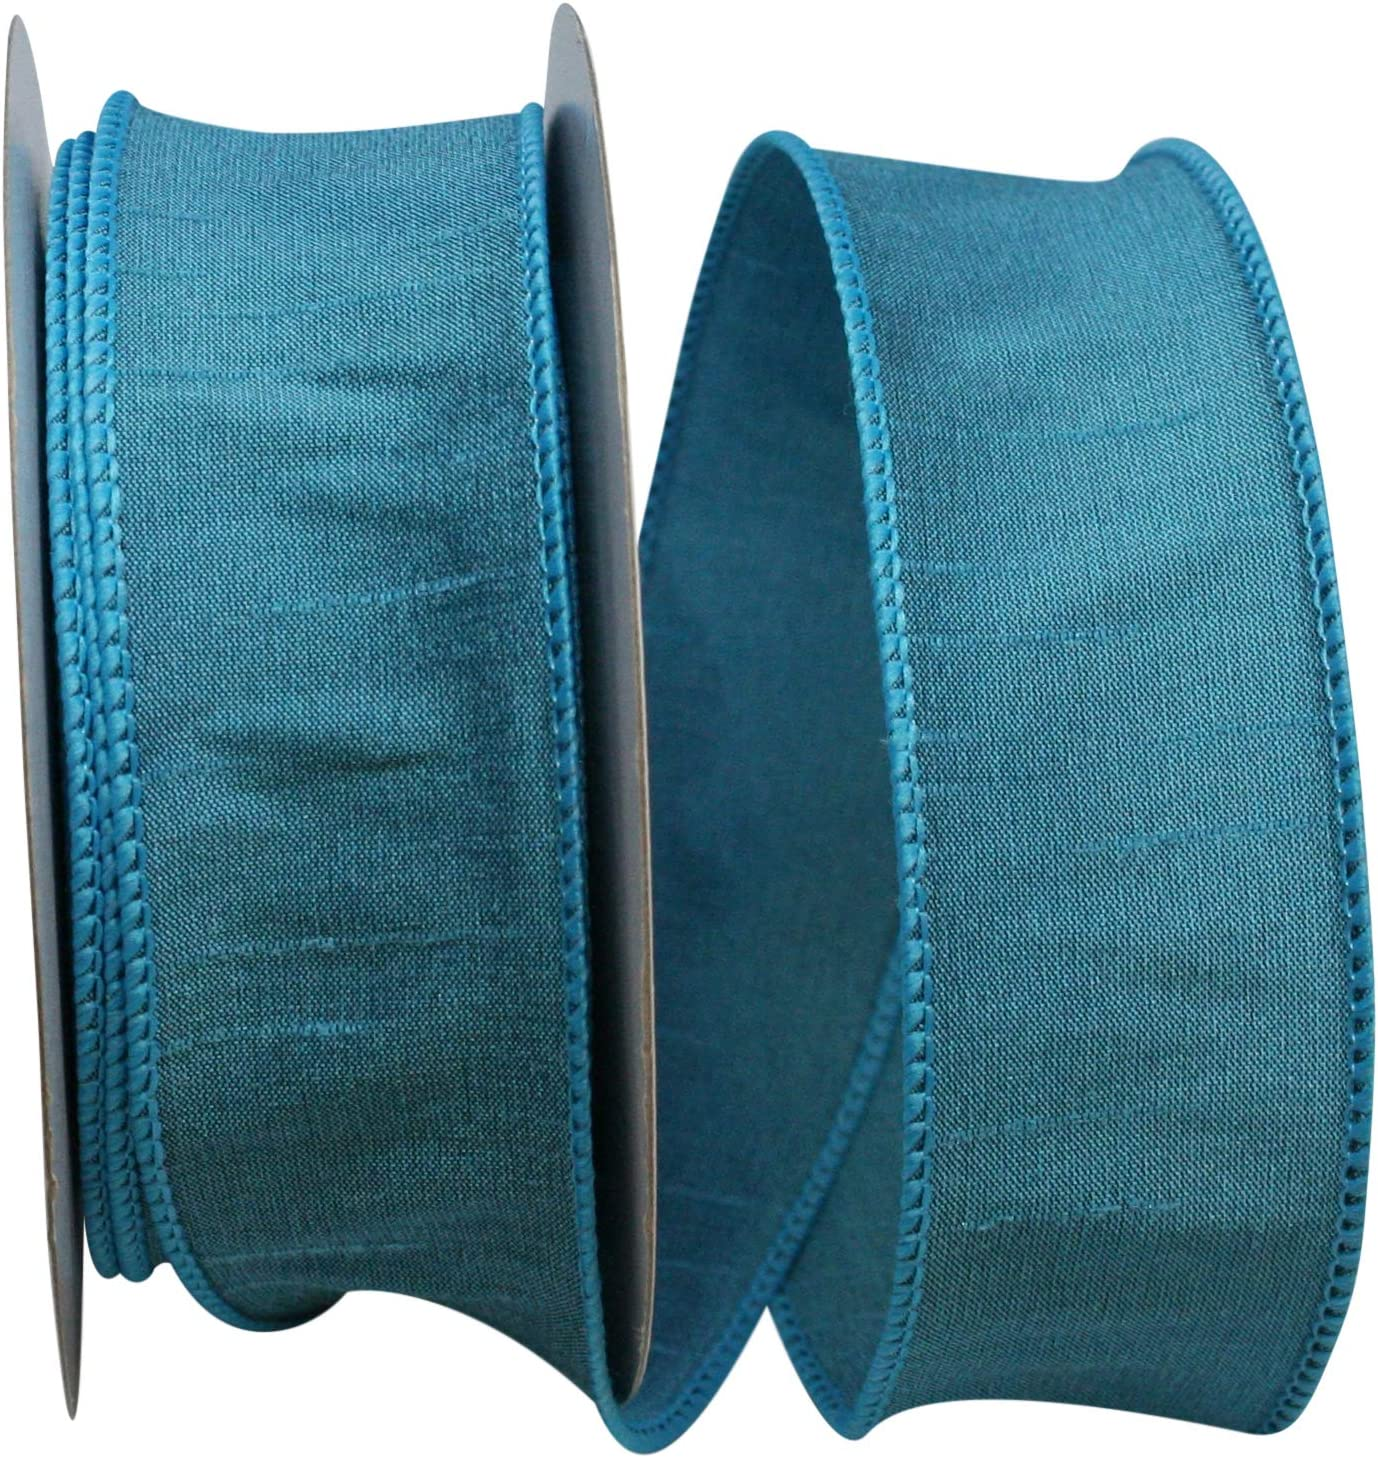 Dupioni Supreme Wired Edge Ribbon 10 Yards 1-1//2-Inch